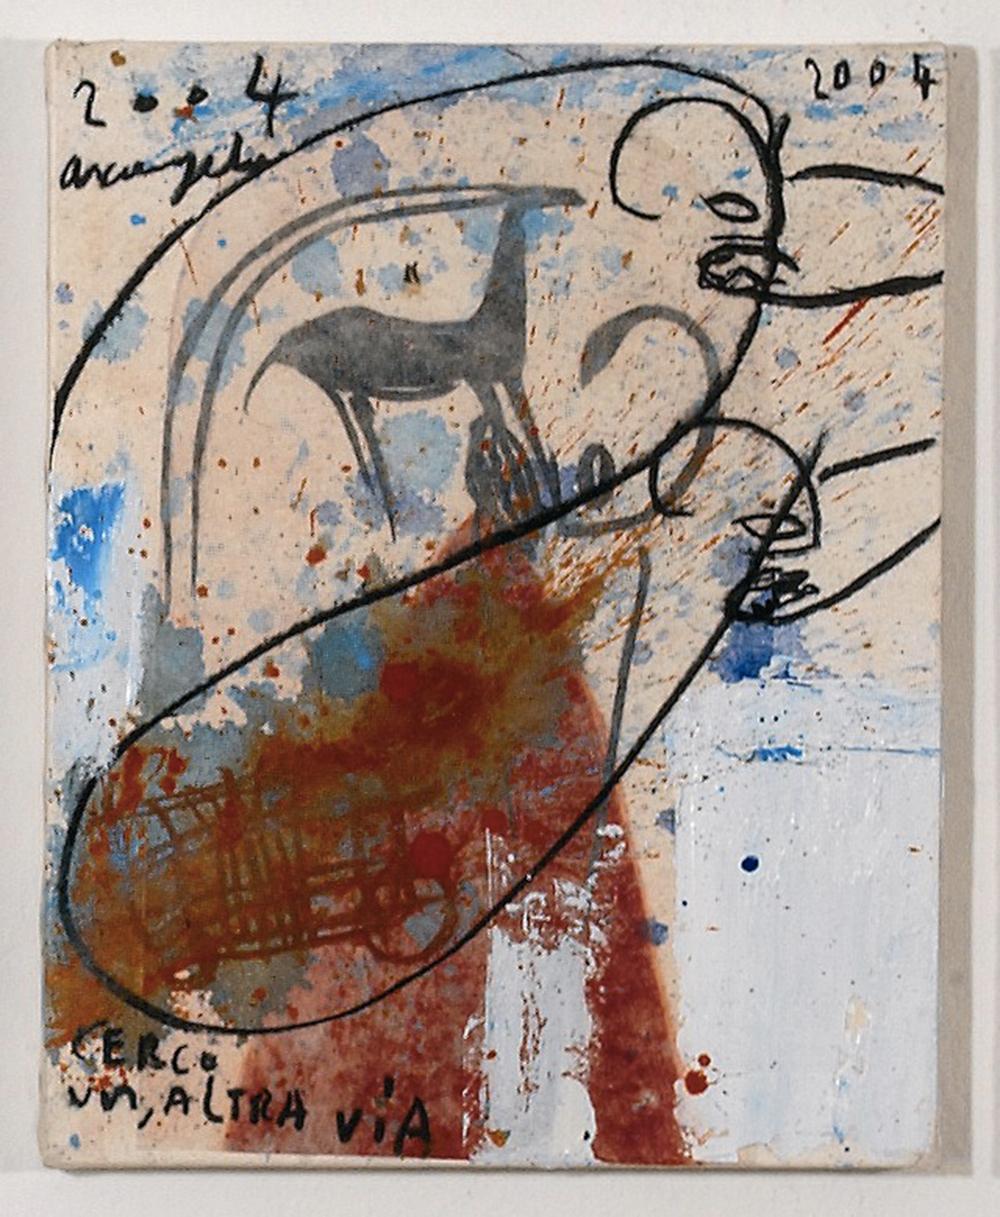 Sanniti, 2004, tecnica mista su carta intelata, cm 30x24